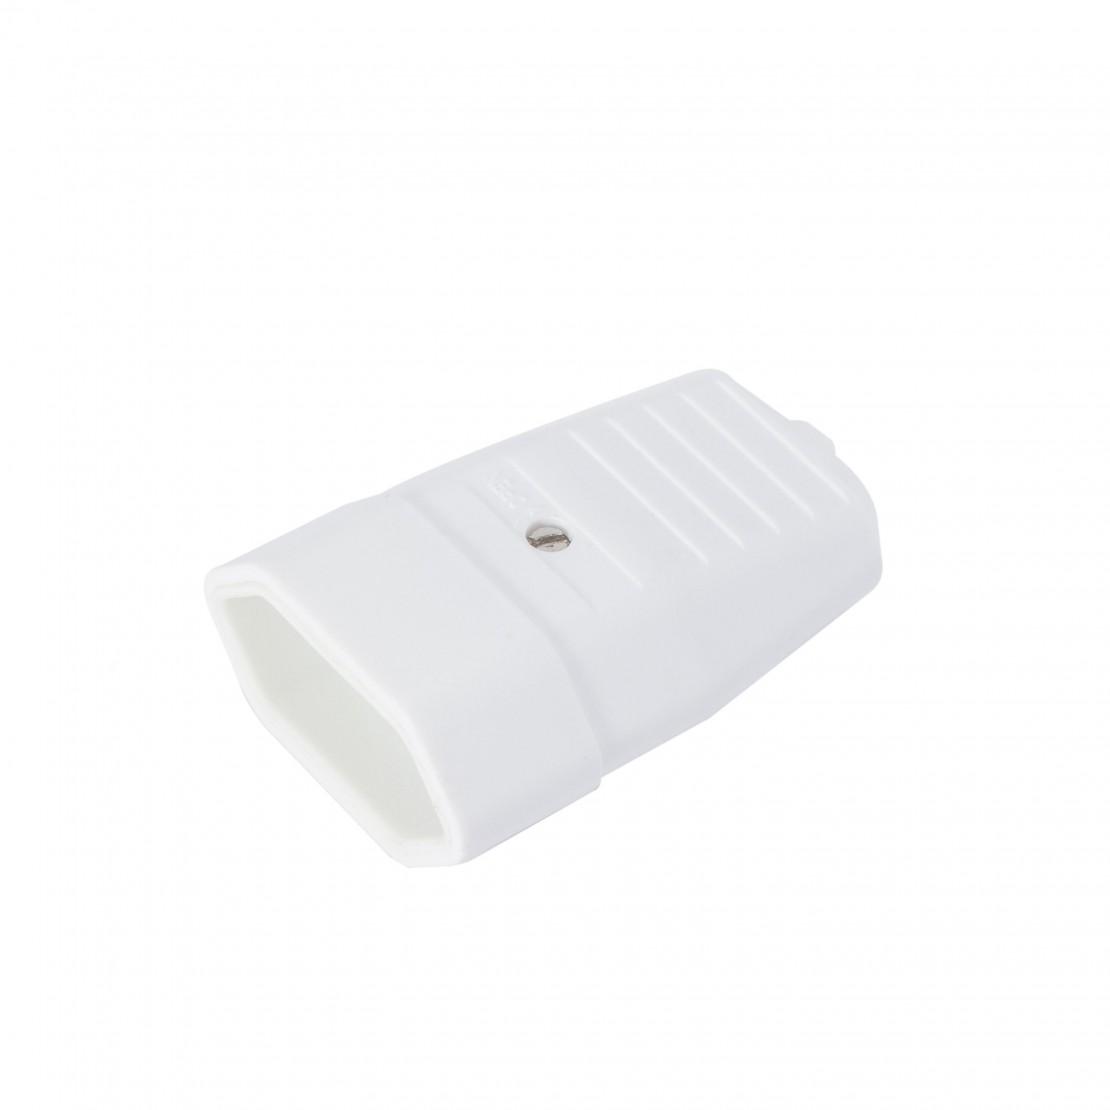 Enchufe móvil plano 2,5 A blanco (2 uds)